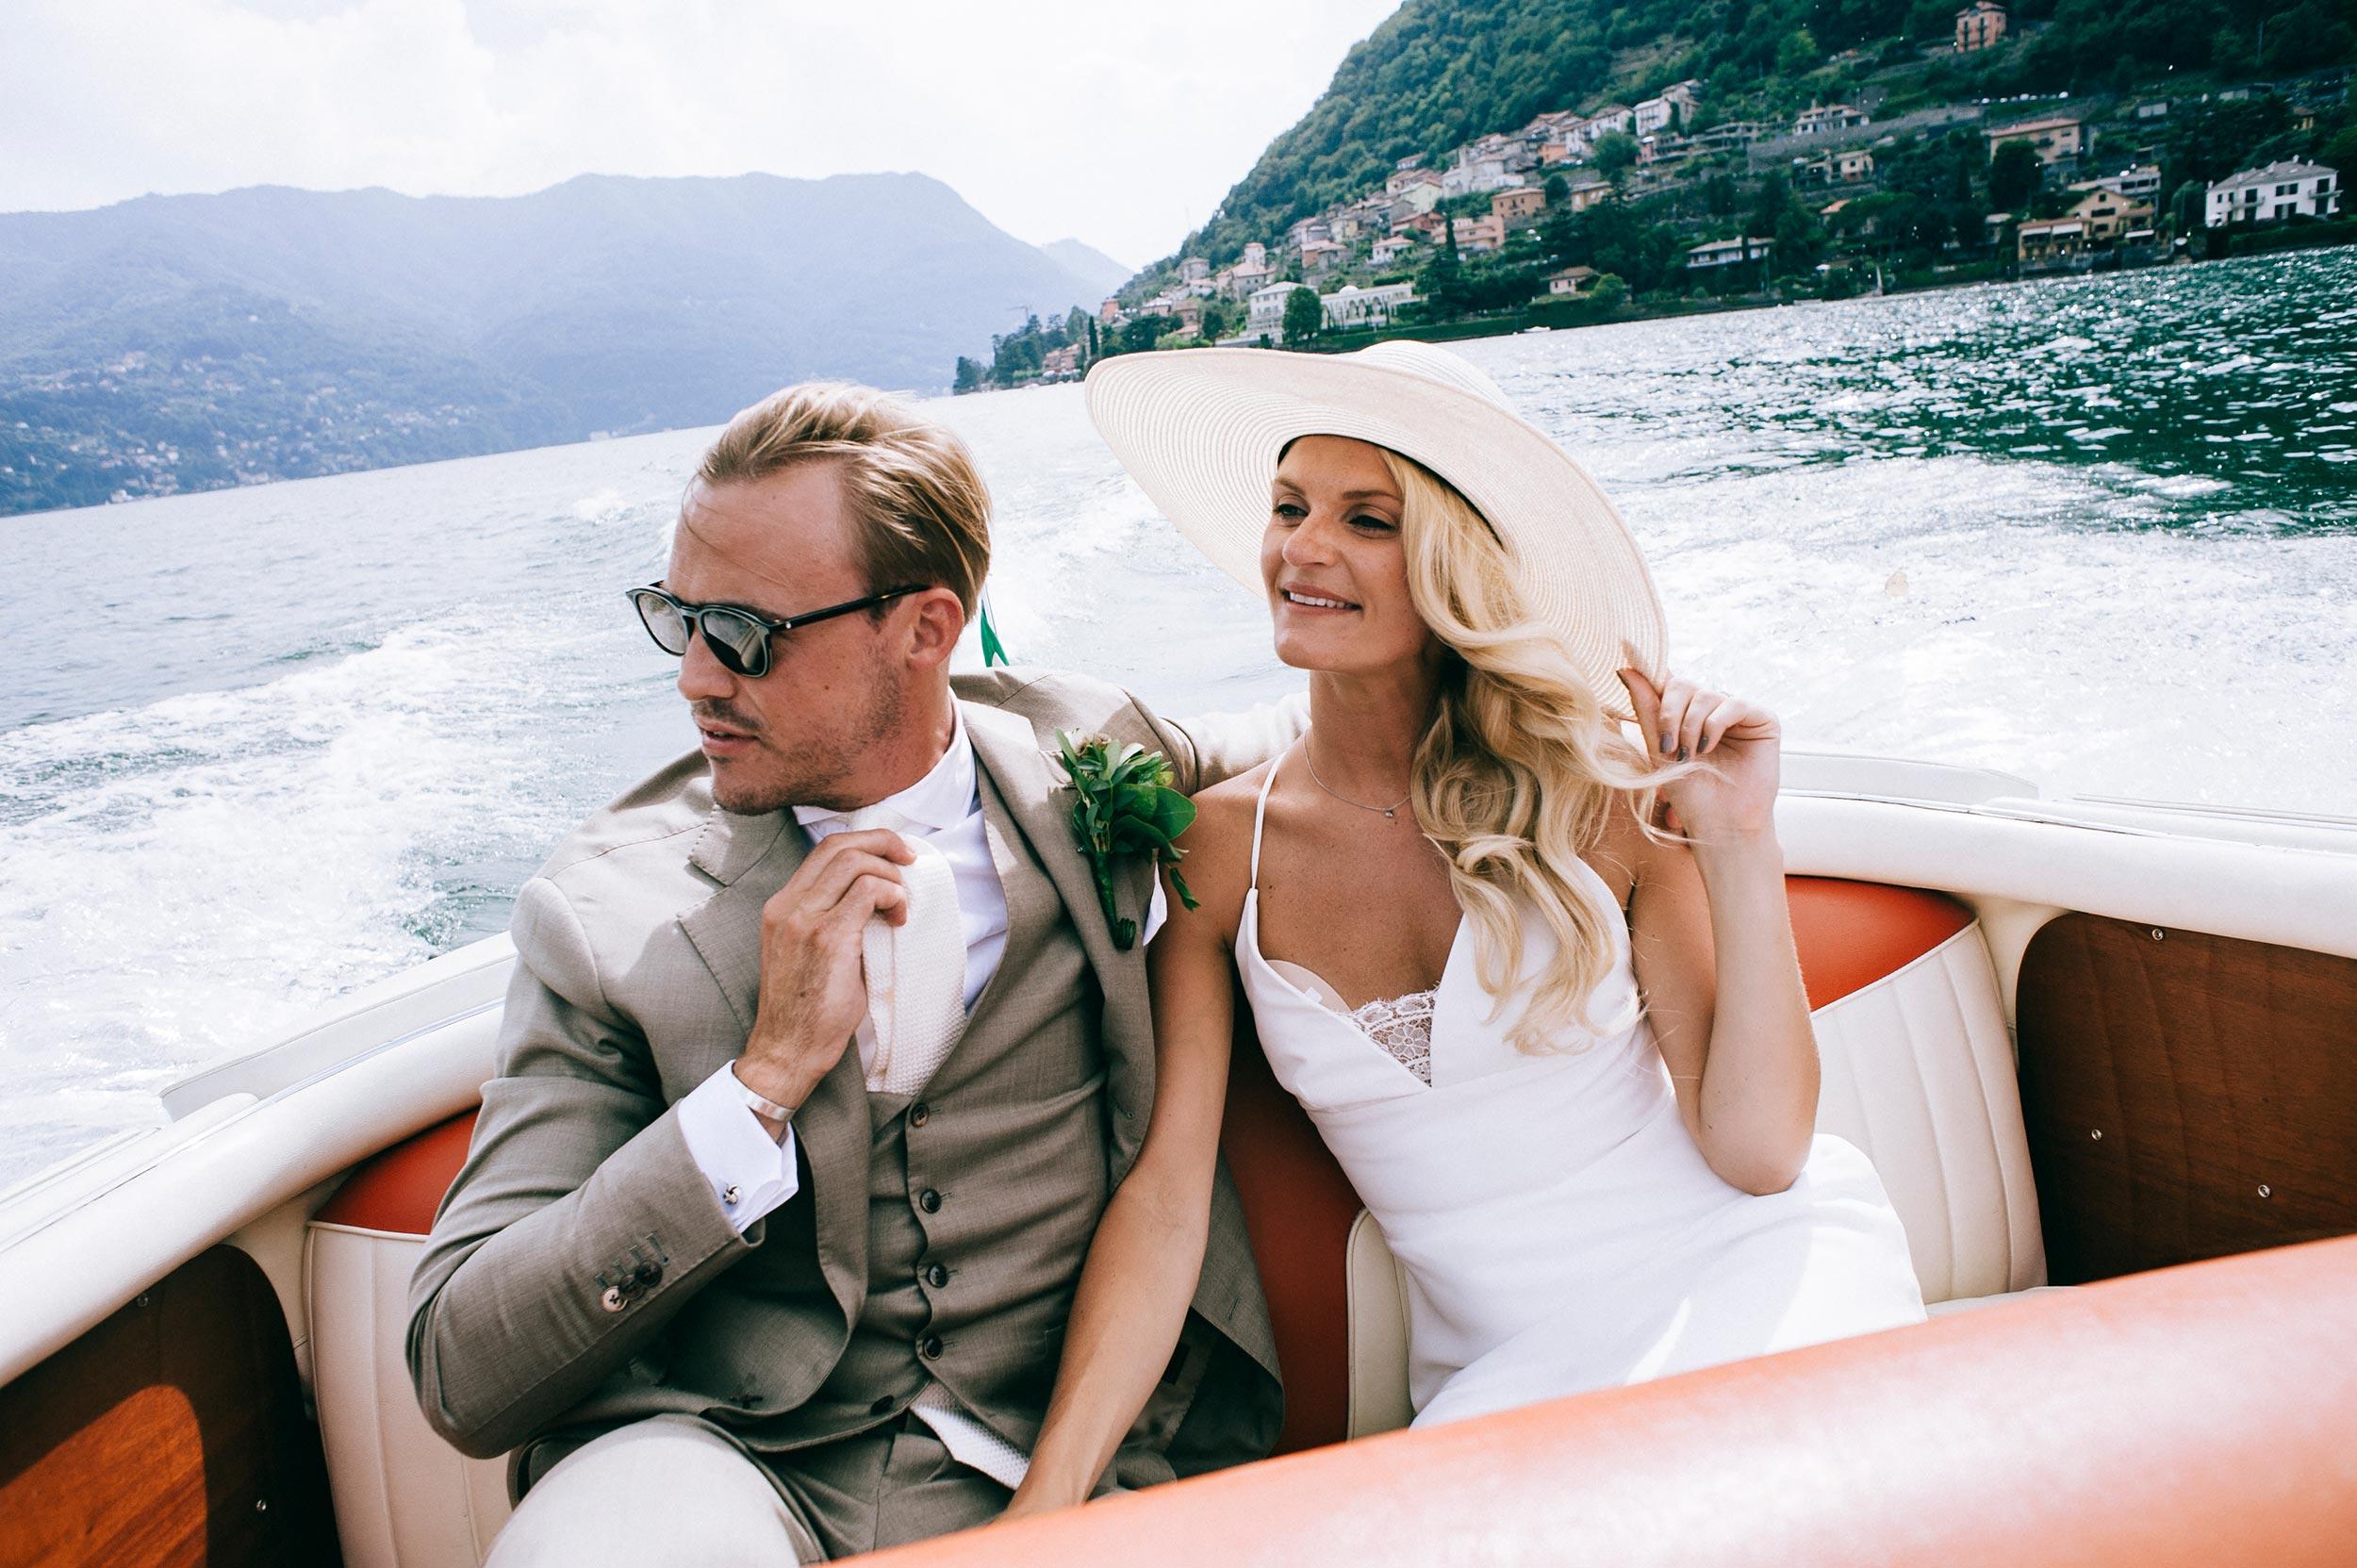 2018-Villa-Regina-Teodolinda-Lake-Como-Wedding-Photographer-Italy-Alessandro-Avenali-141.jpg